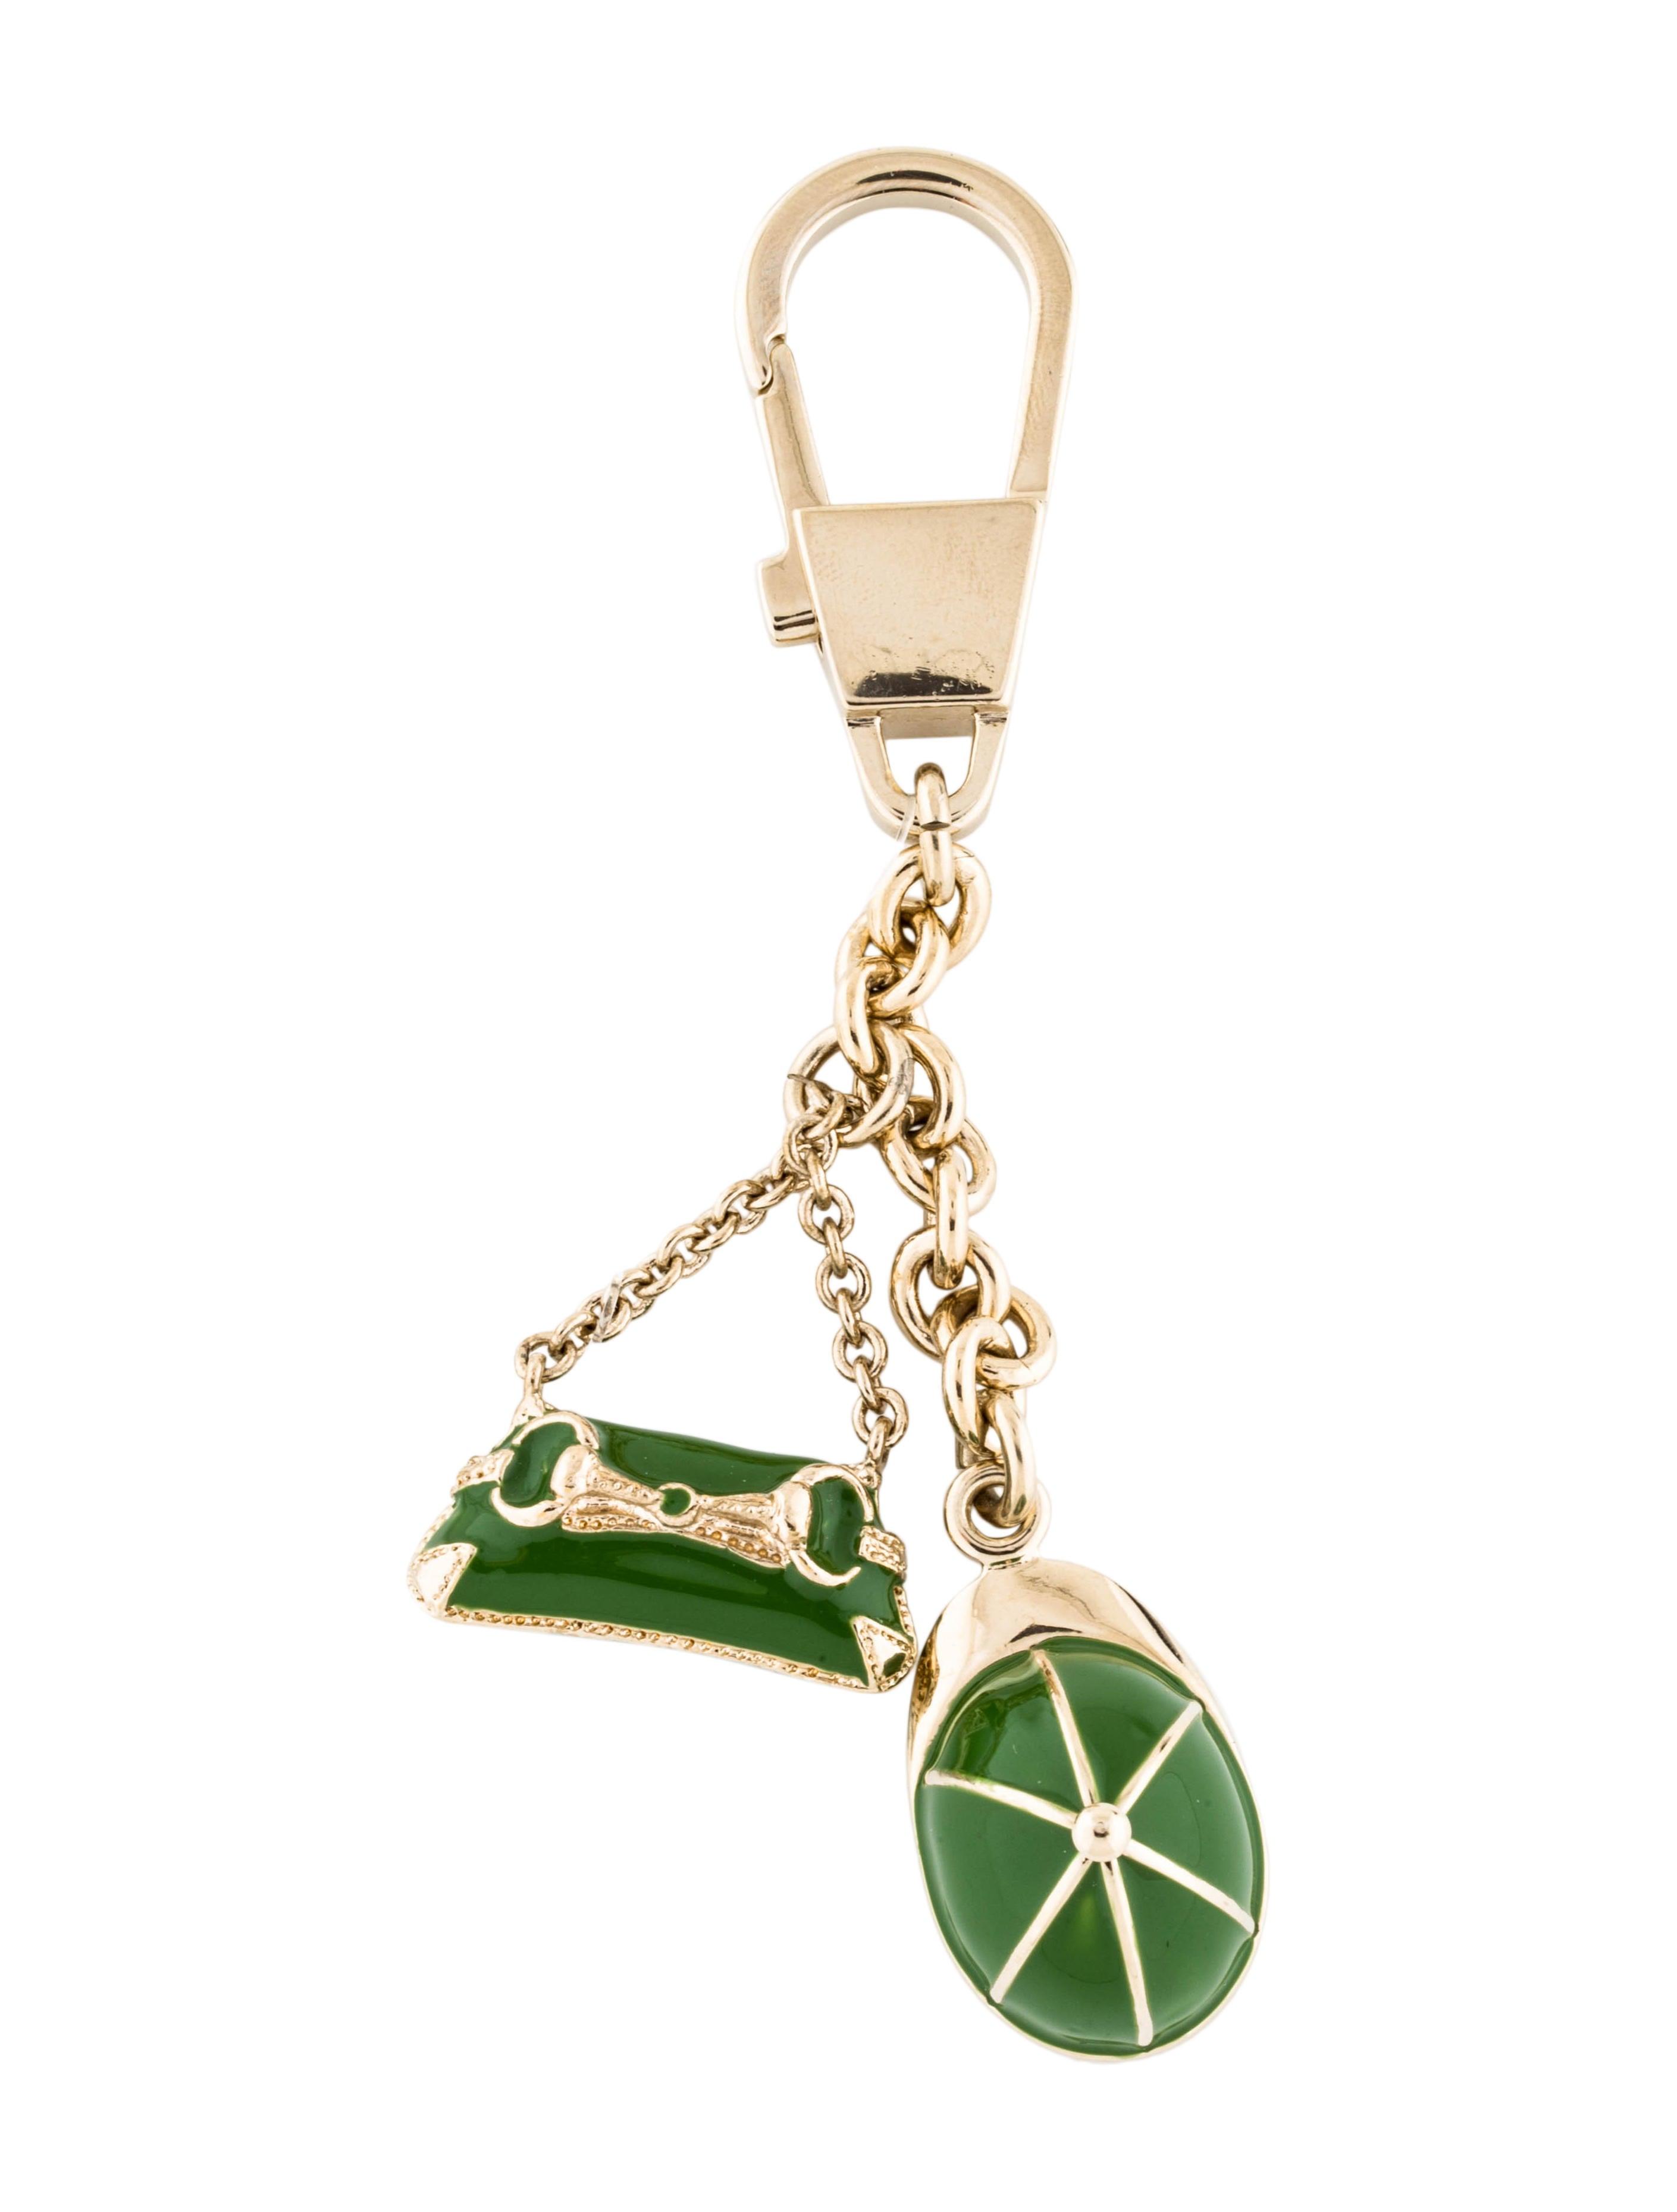 8b995351c94 Gucci Hat   Bag Travel Keychain - Accessories - GUC271420